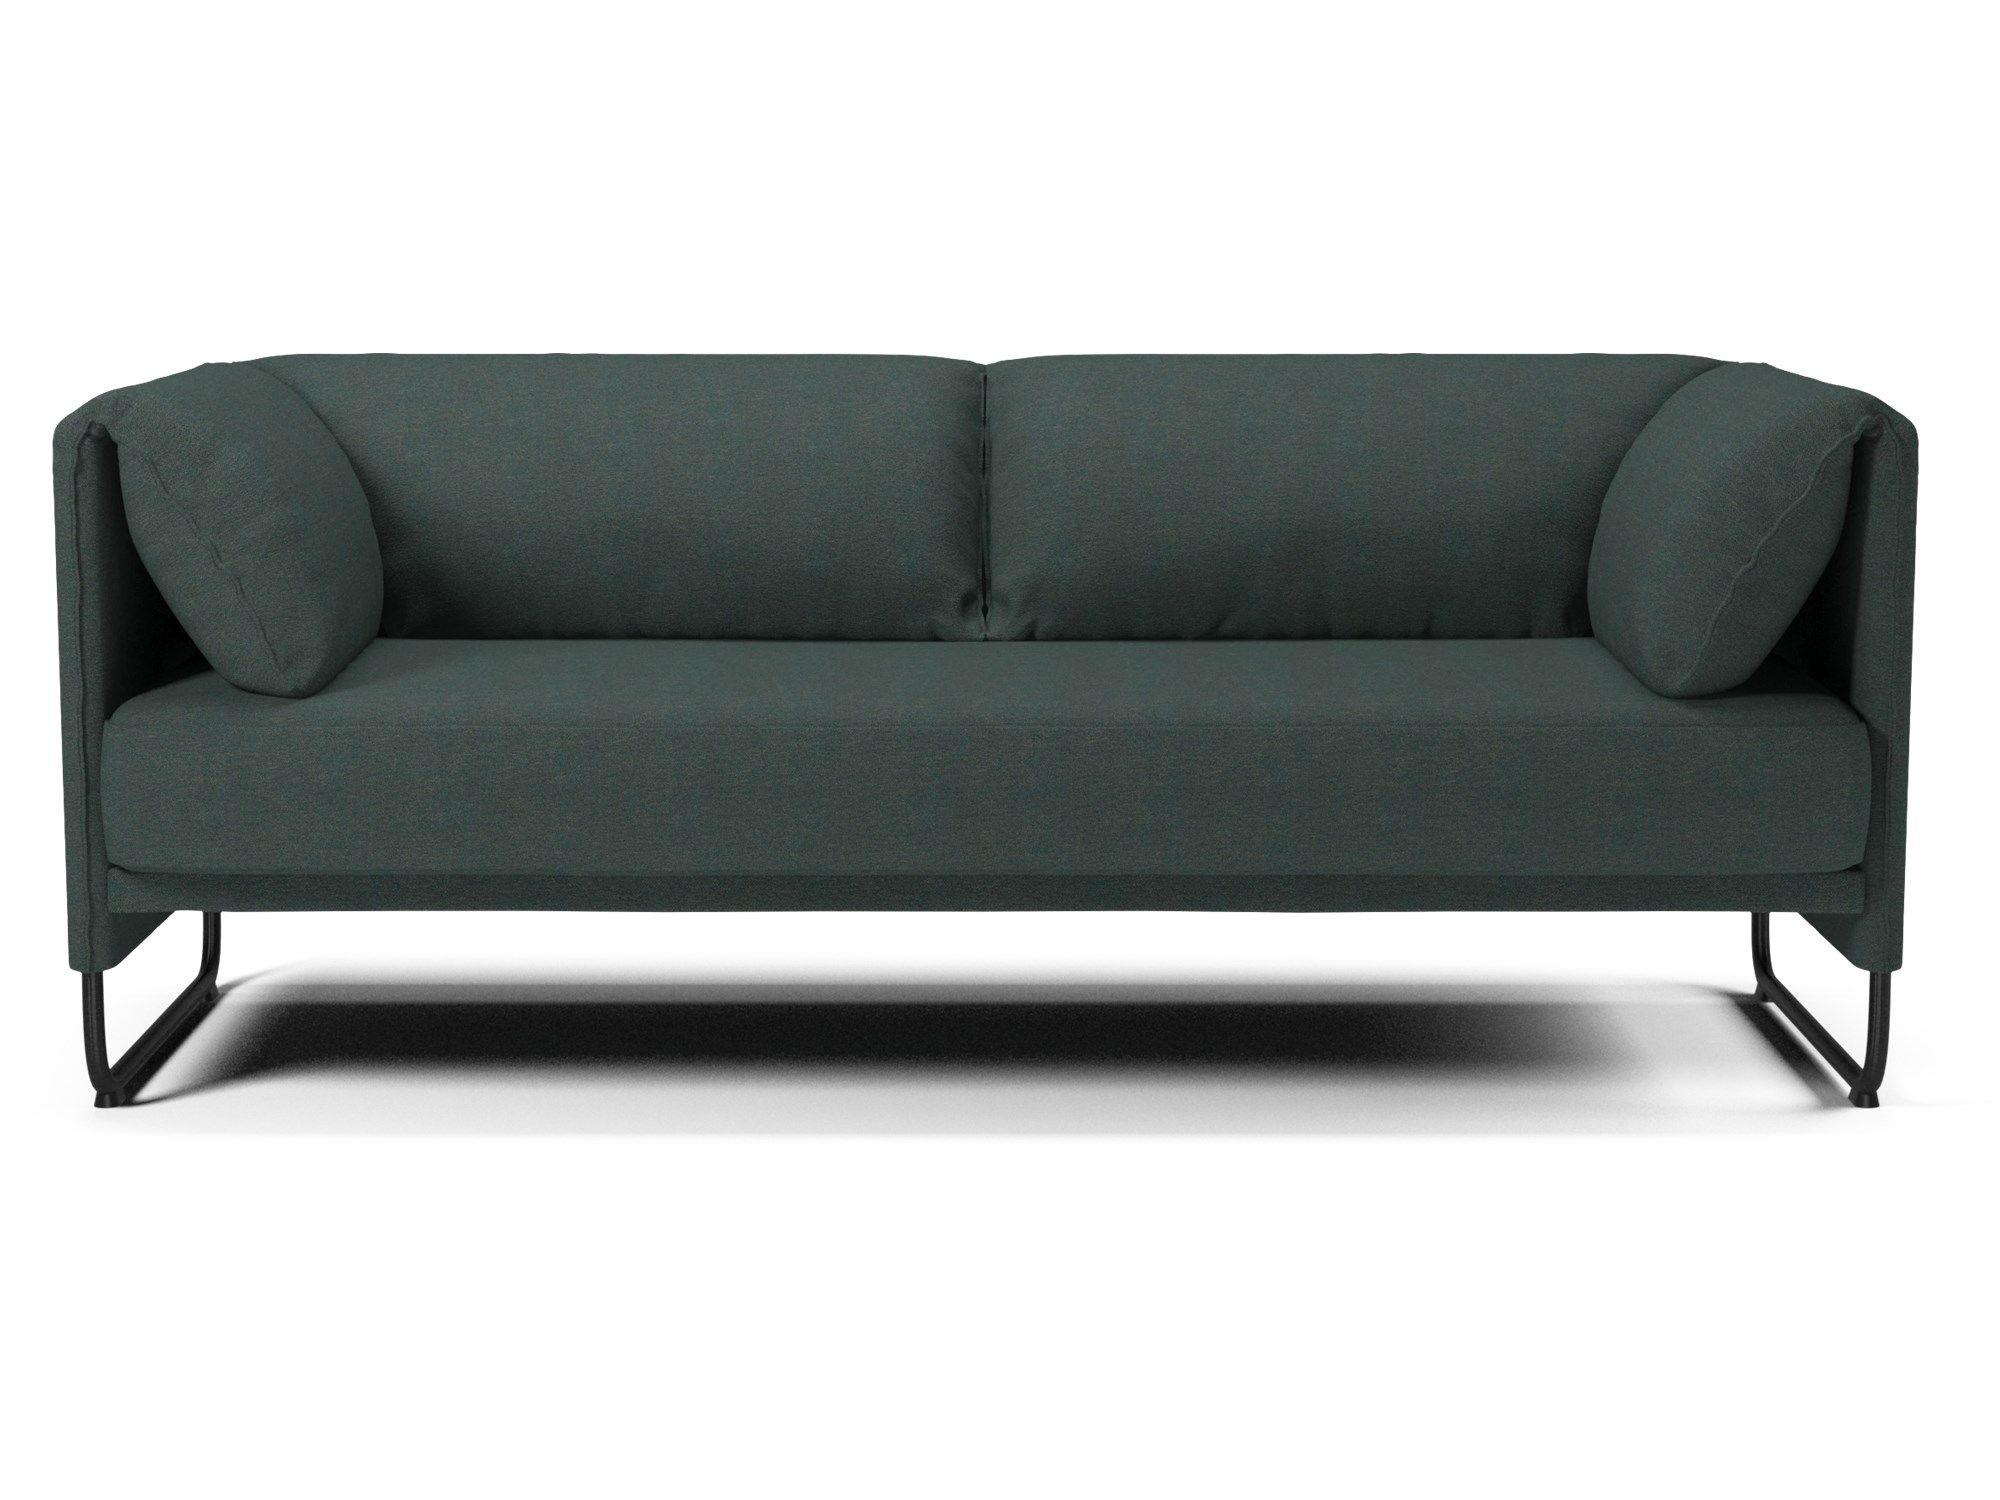 Bolia Mara sofa 8 999 ord 17 999 Outlet produkt